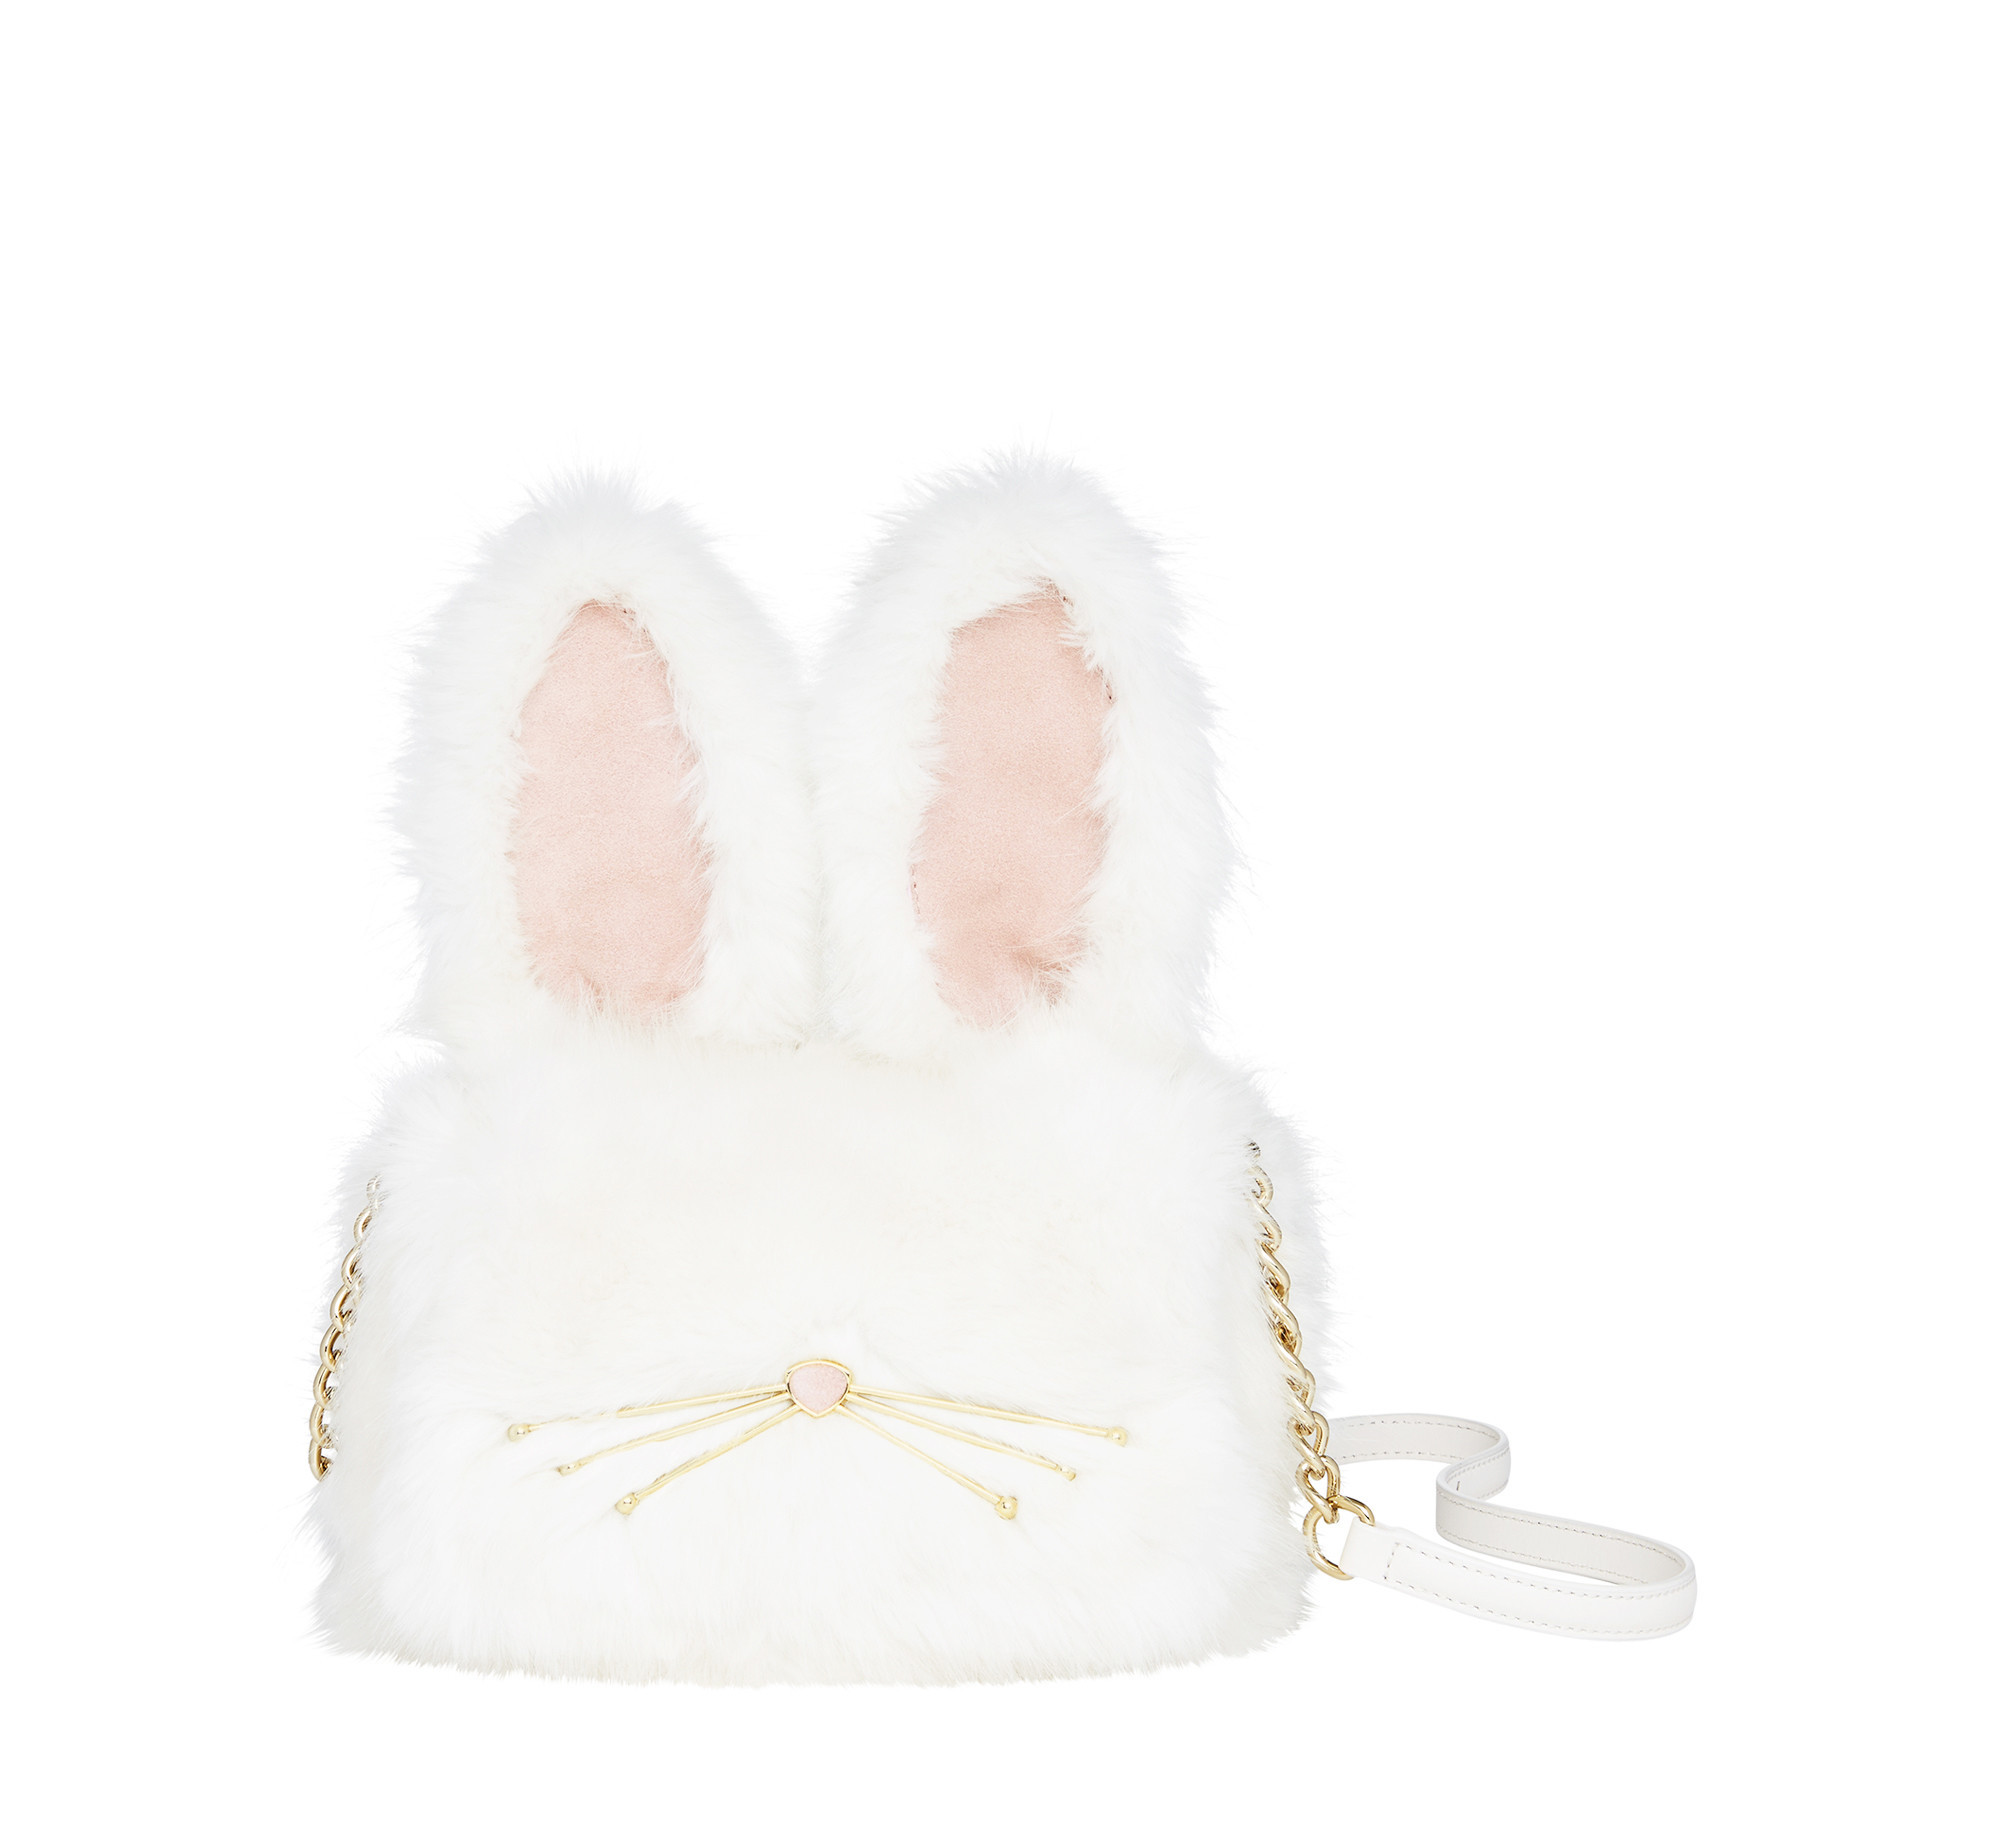 Kate Spade Make Magic Rabbit Shoulder Bag and Muff, $398 at katespade.com